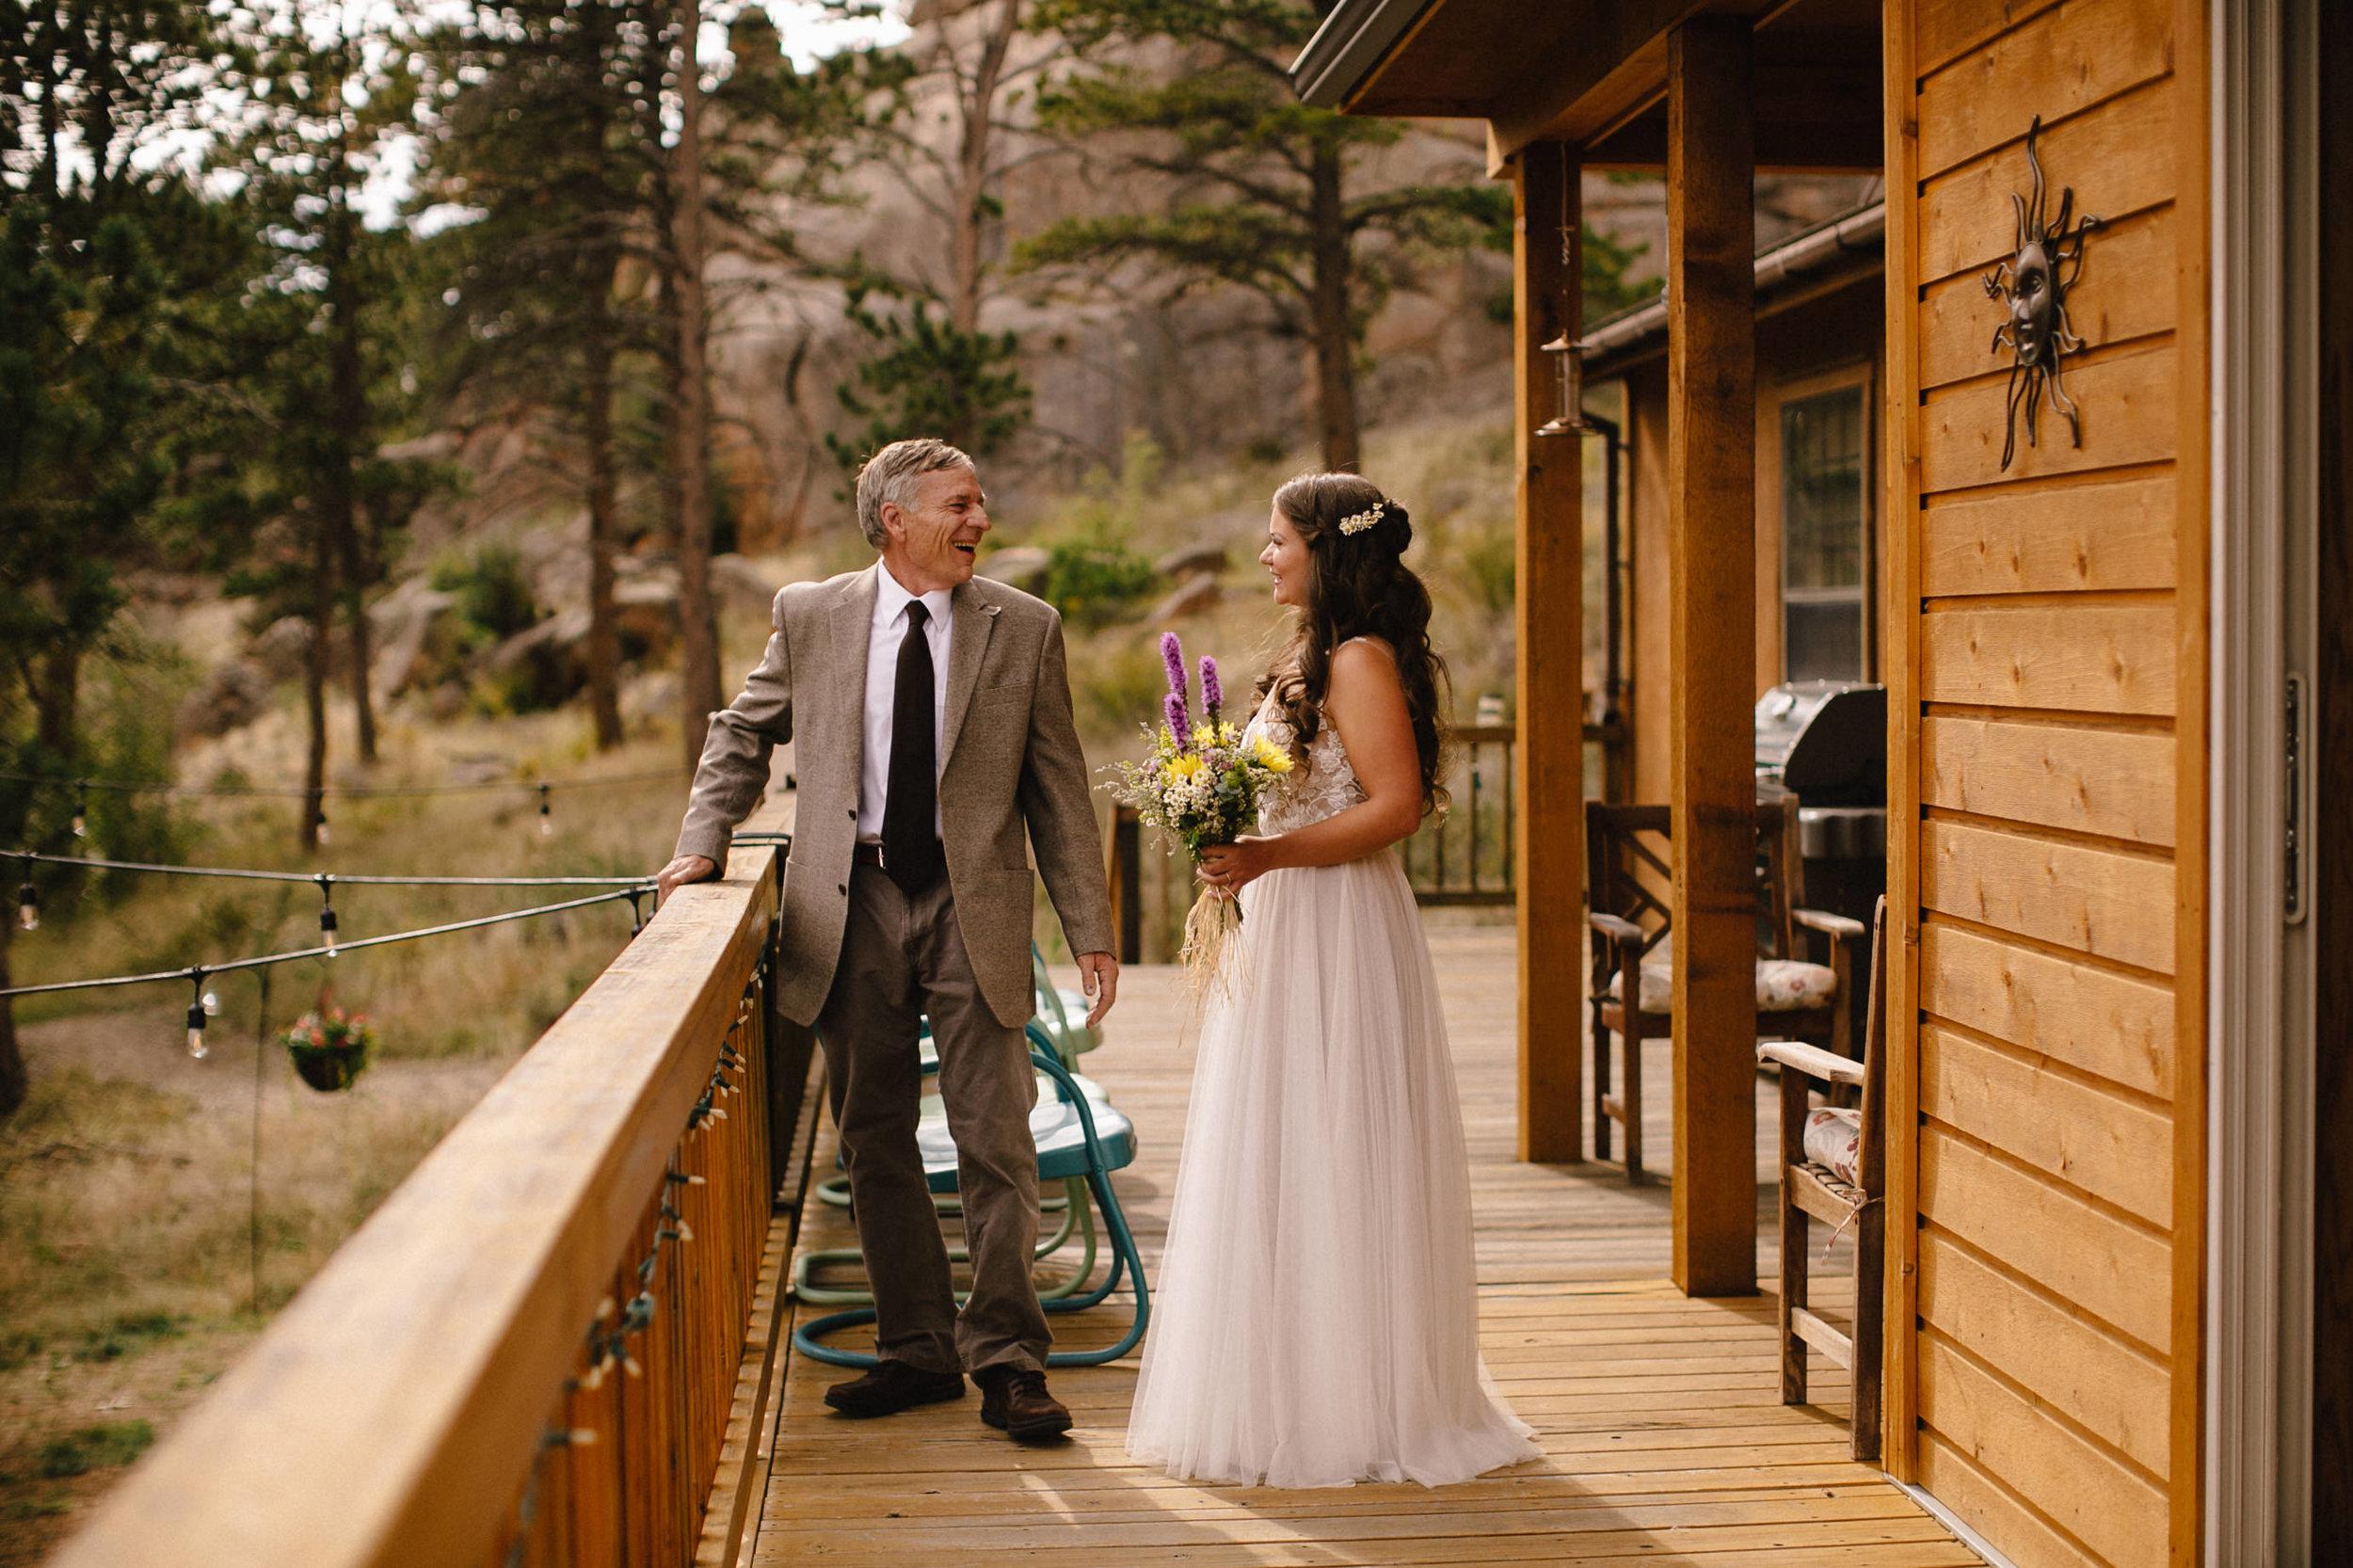 Liz Osban Photography Vedauwoo Buford Wyoming Happy Jack Wedding Elopement Destination Small Forest Cheyenne Laramie Medicine Bow National Forest Getting Ready22.jpg